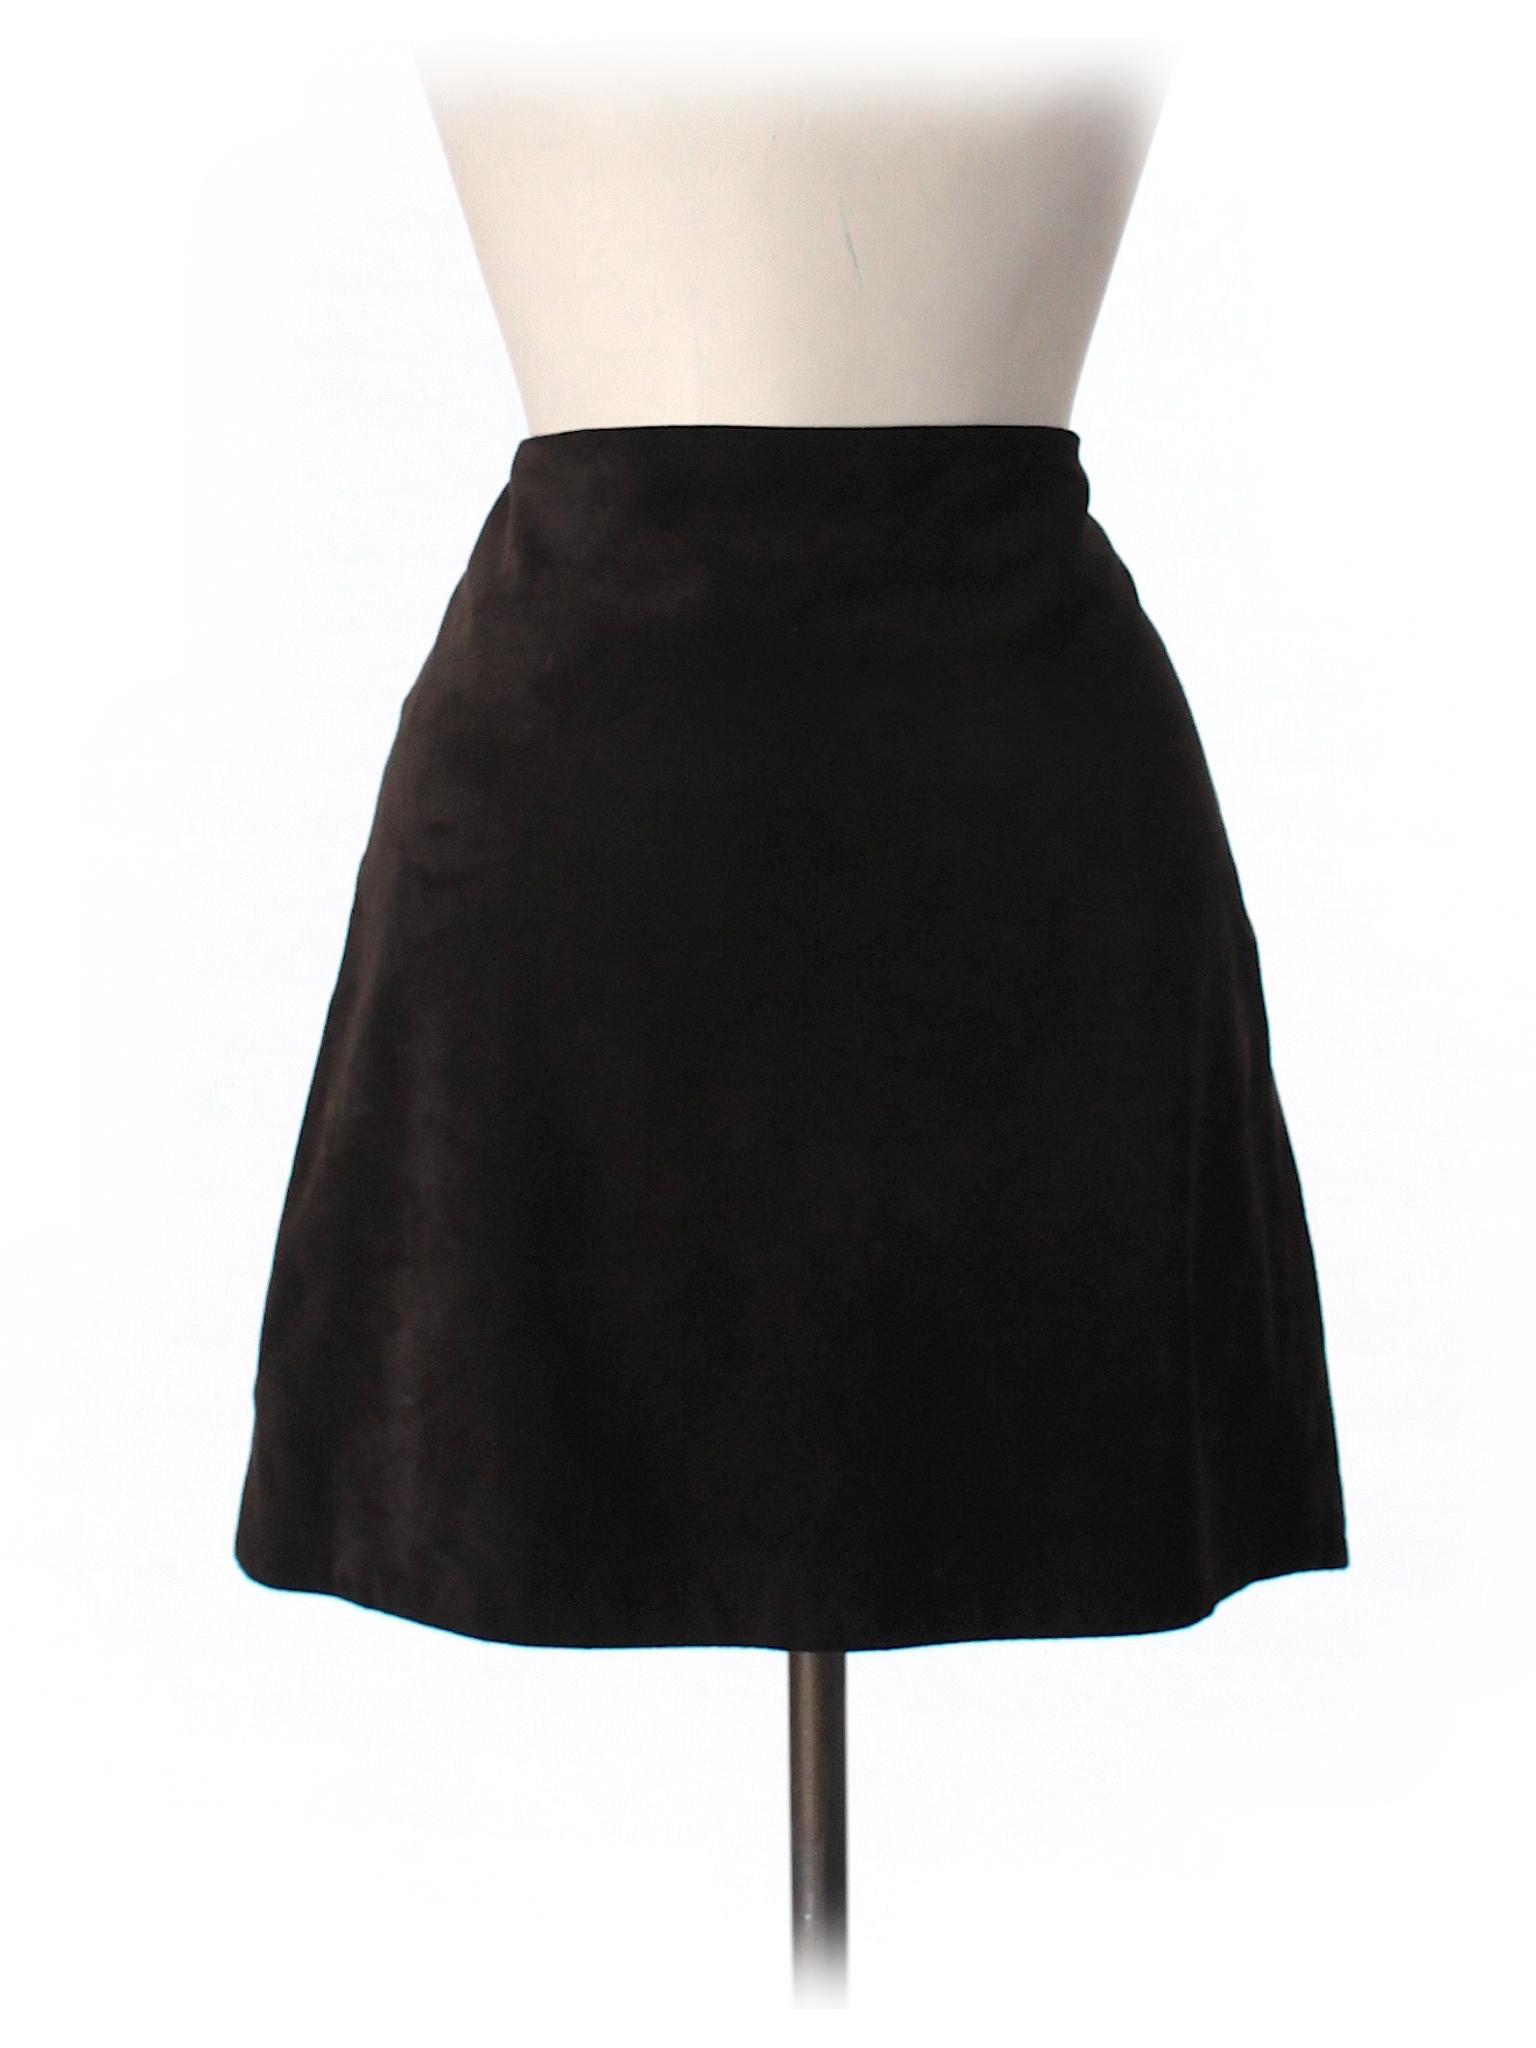 banana republic leather skirt 81 only on thredup